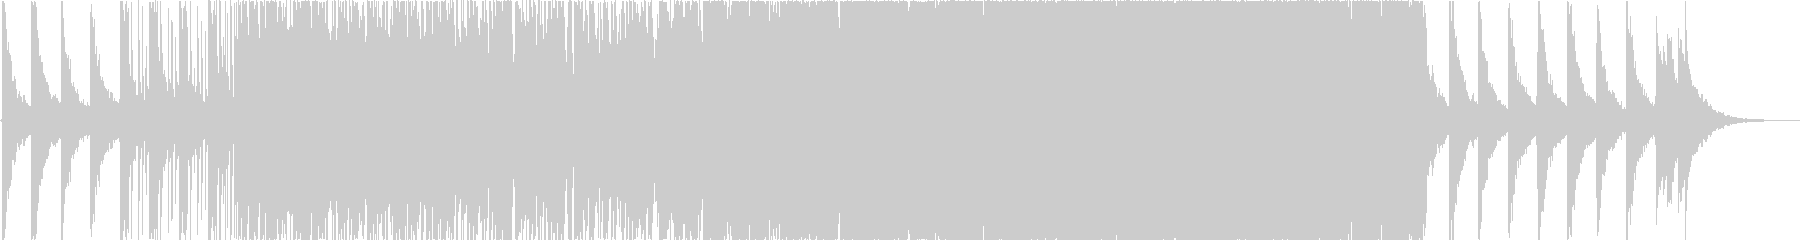 youtubeに使えそうなBGMの未再生の波形